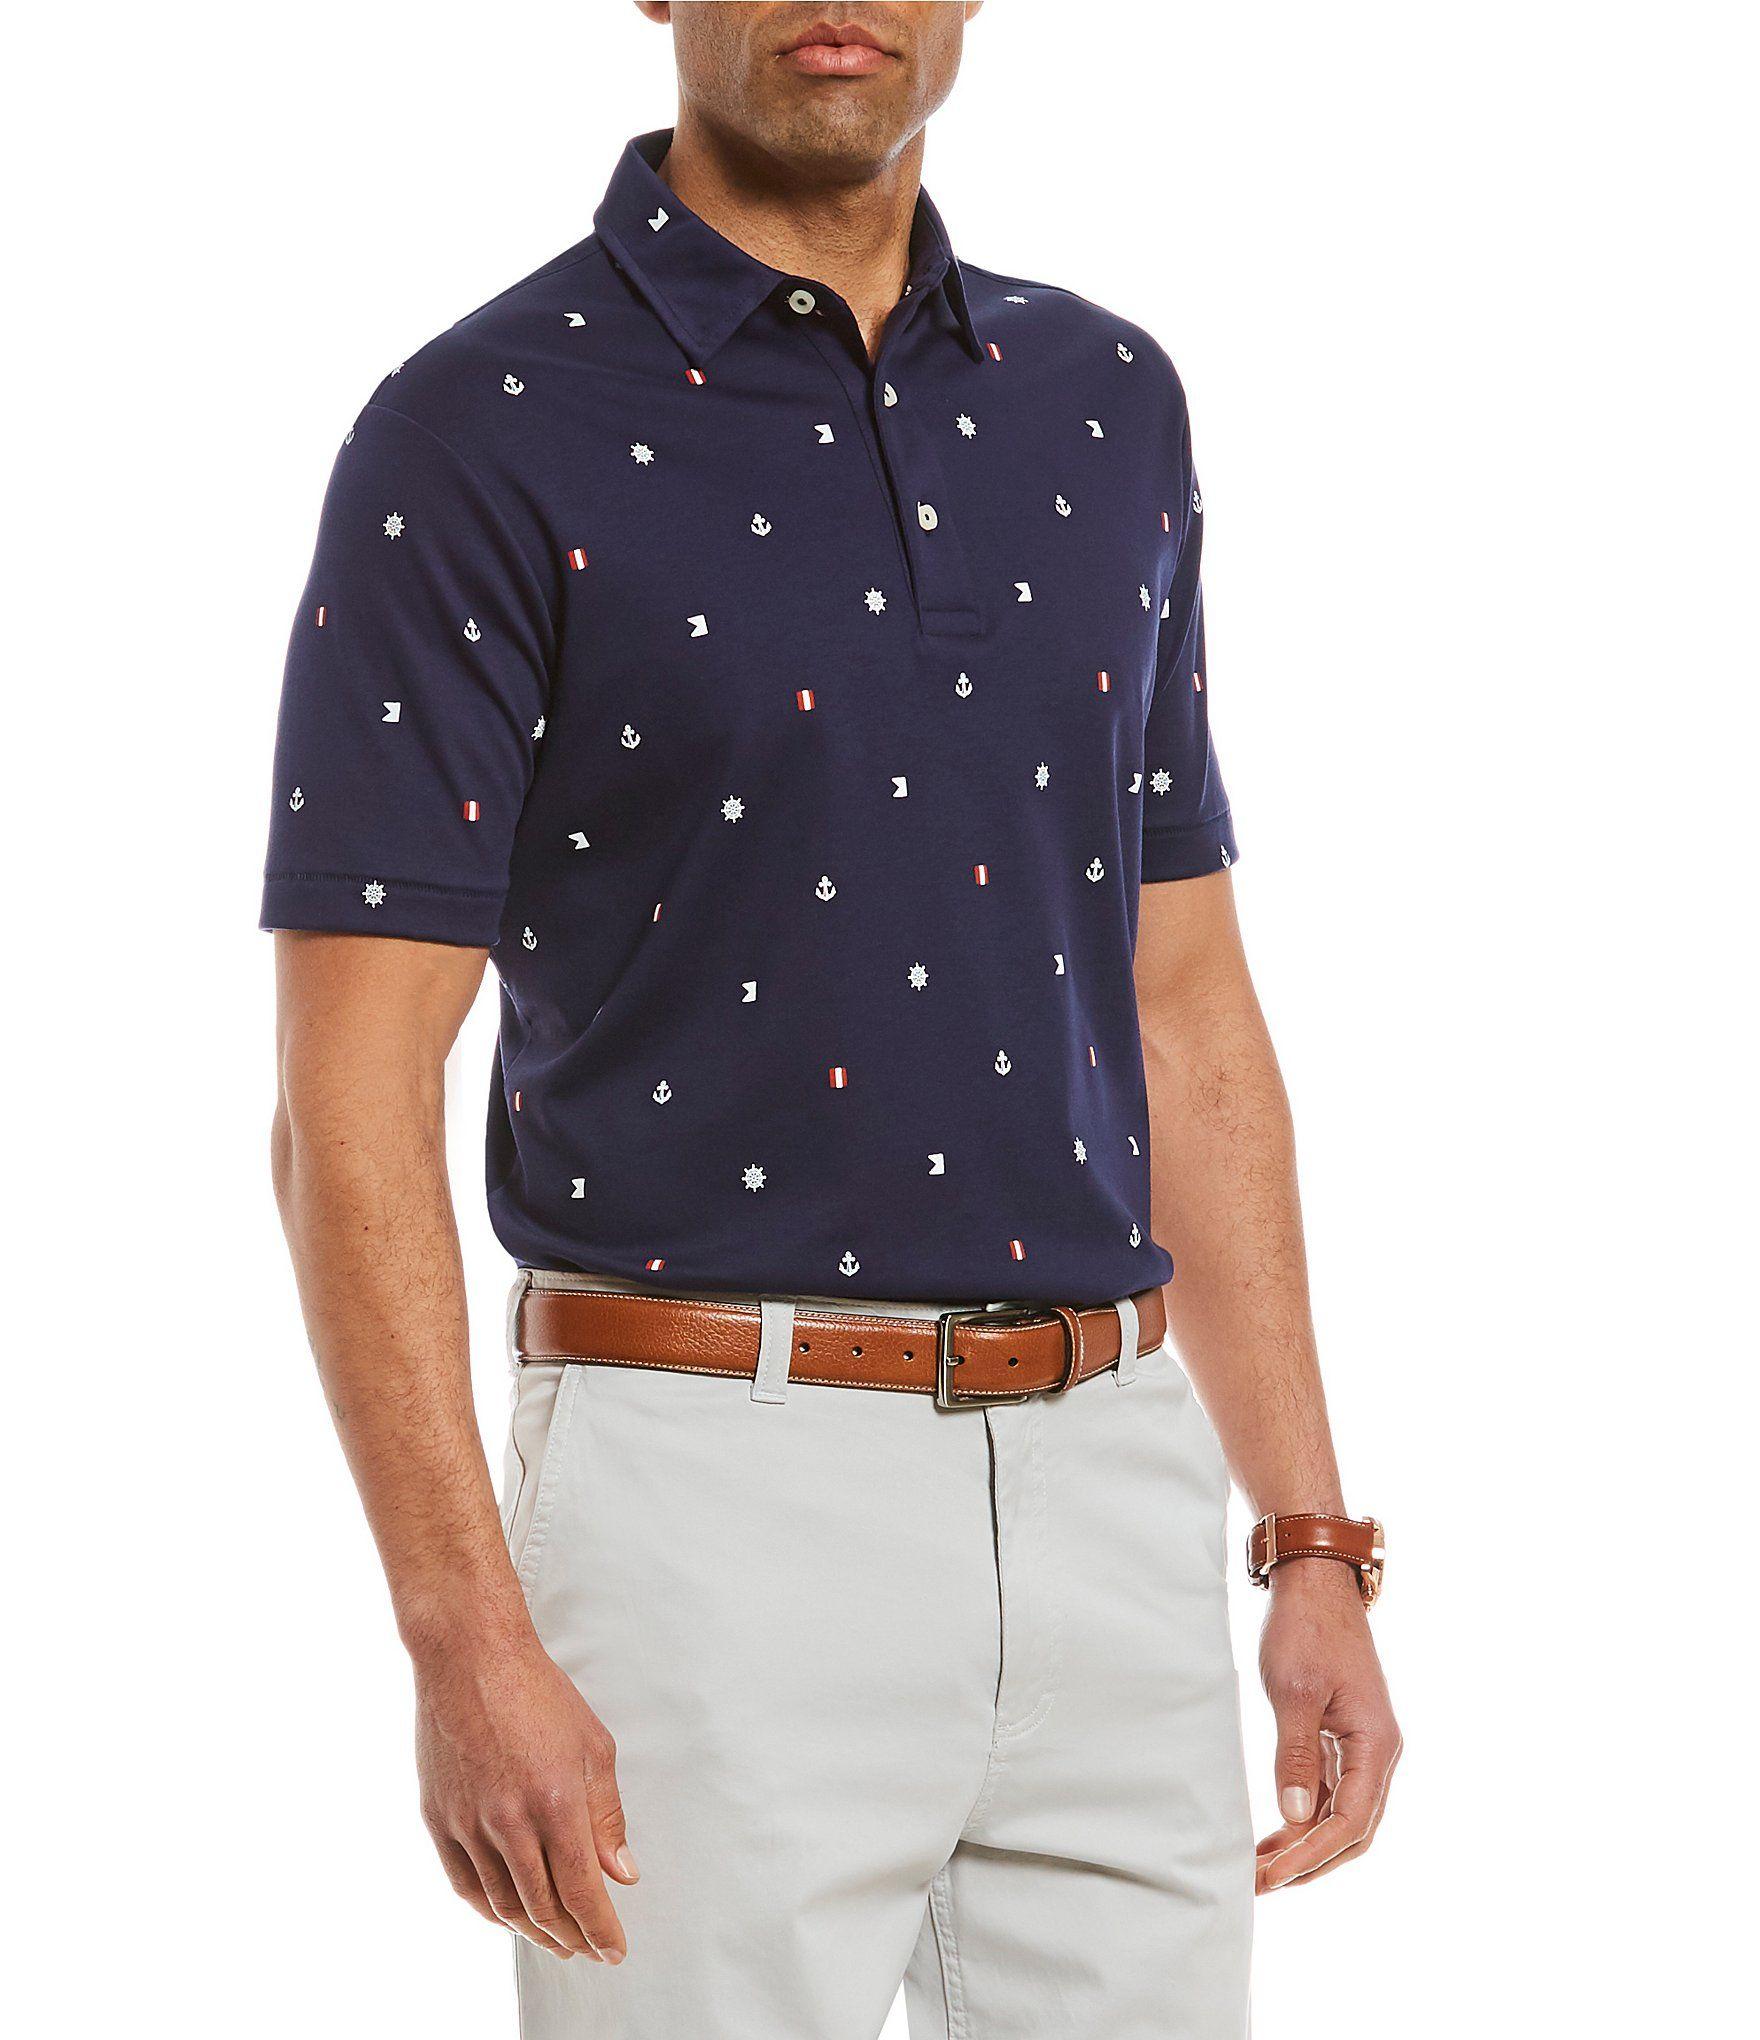 907fbe35 Polo Button Down Shirts Dillards | Top Mode Depot